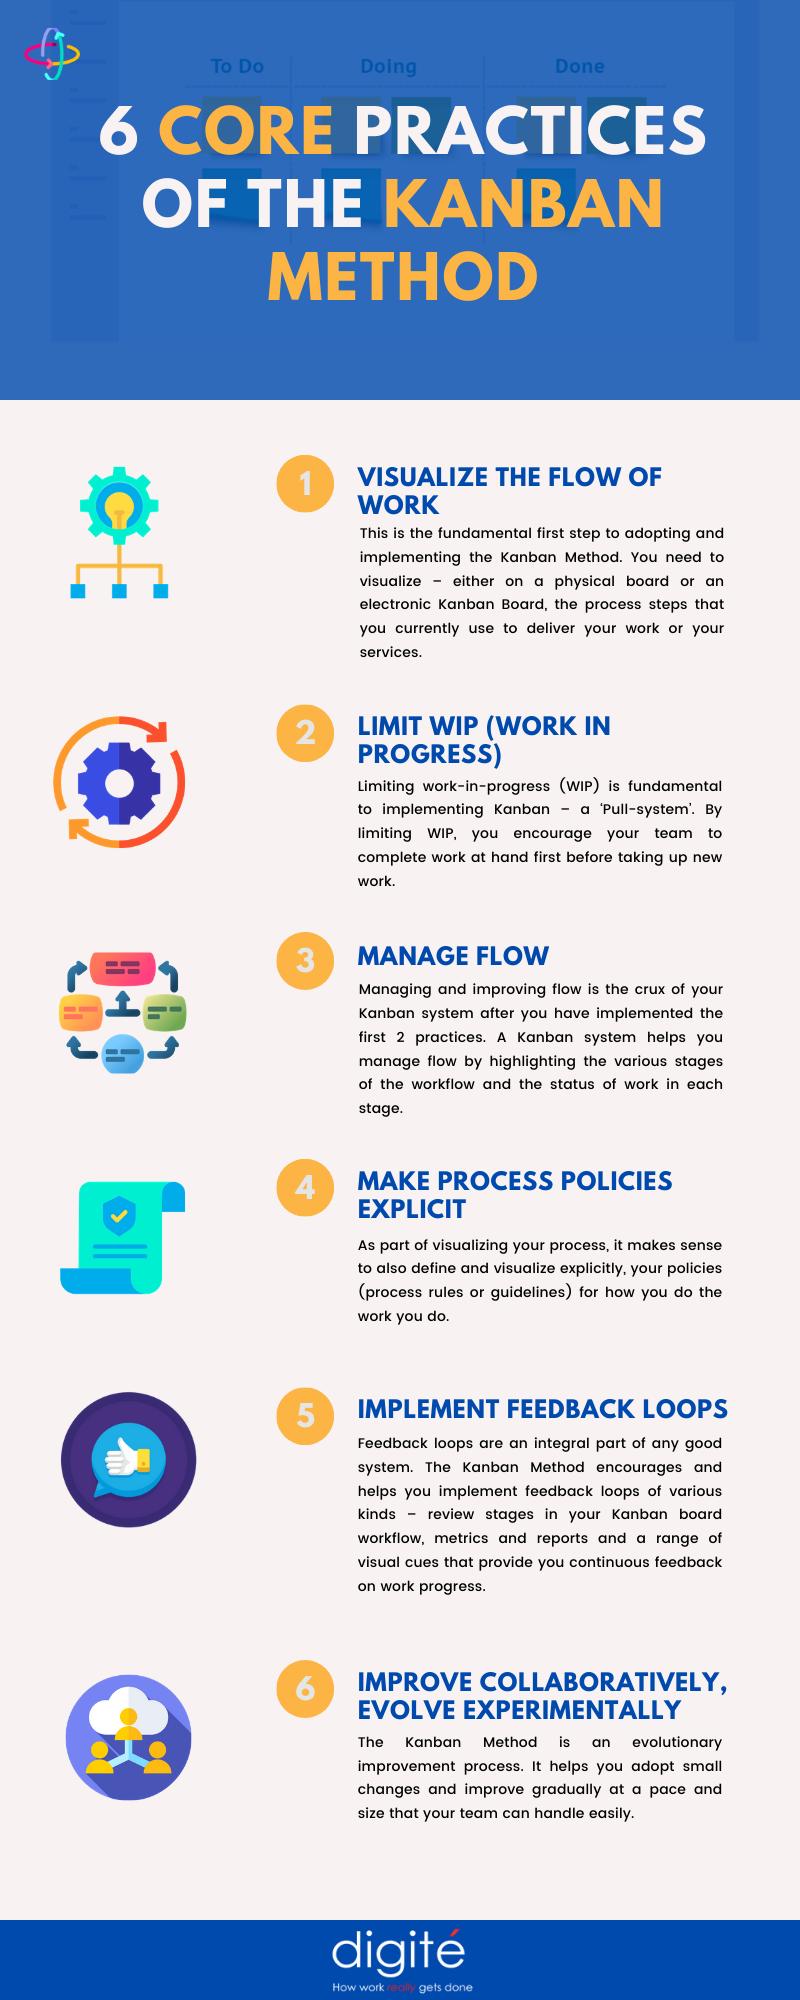 6 Core Practices of Kanban